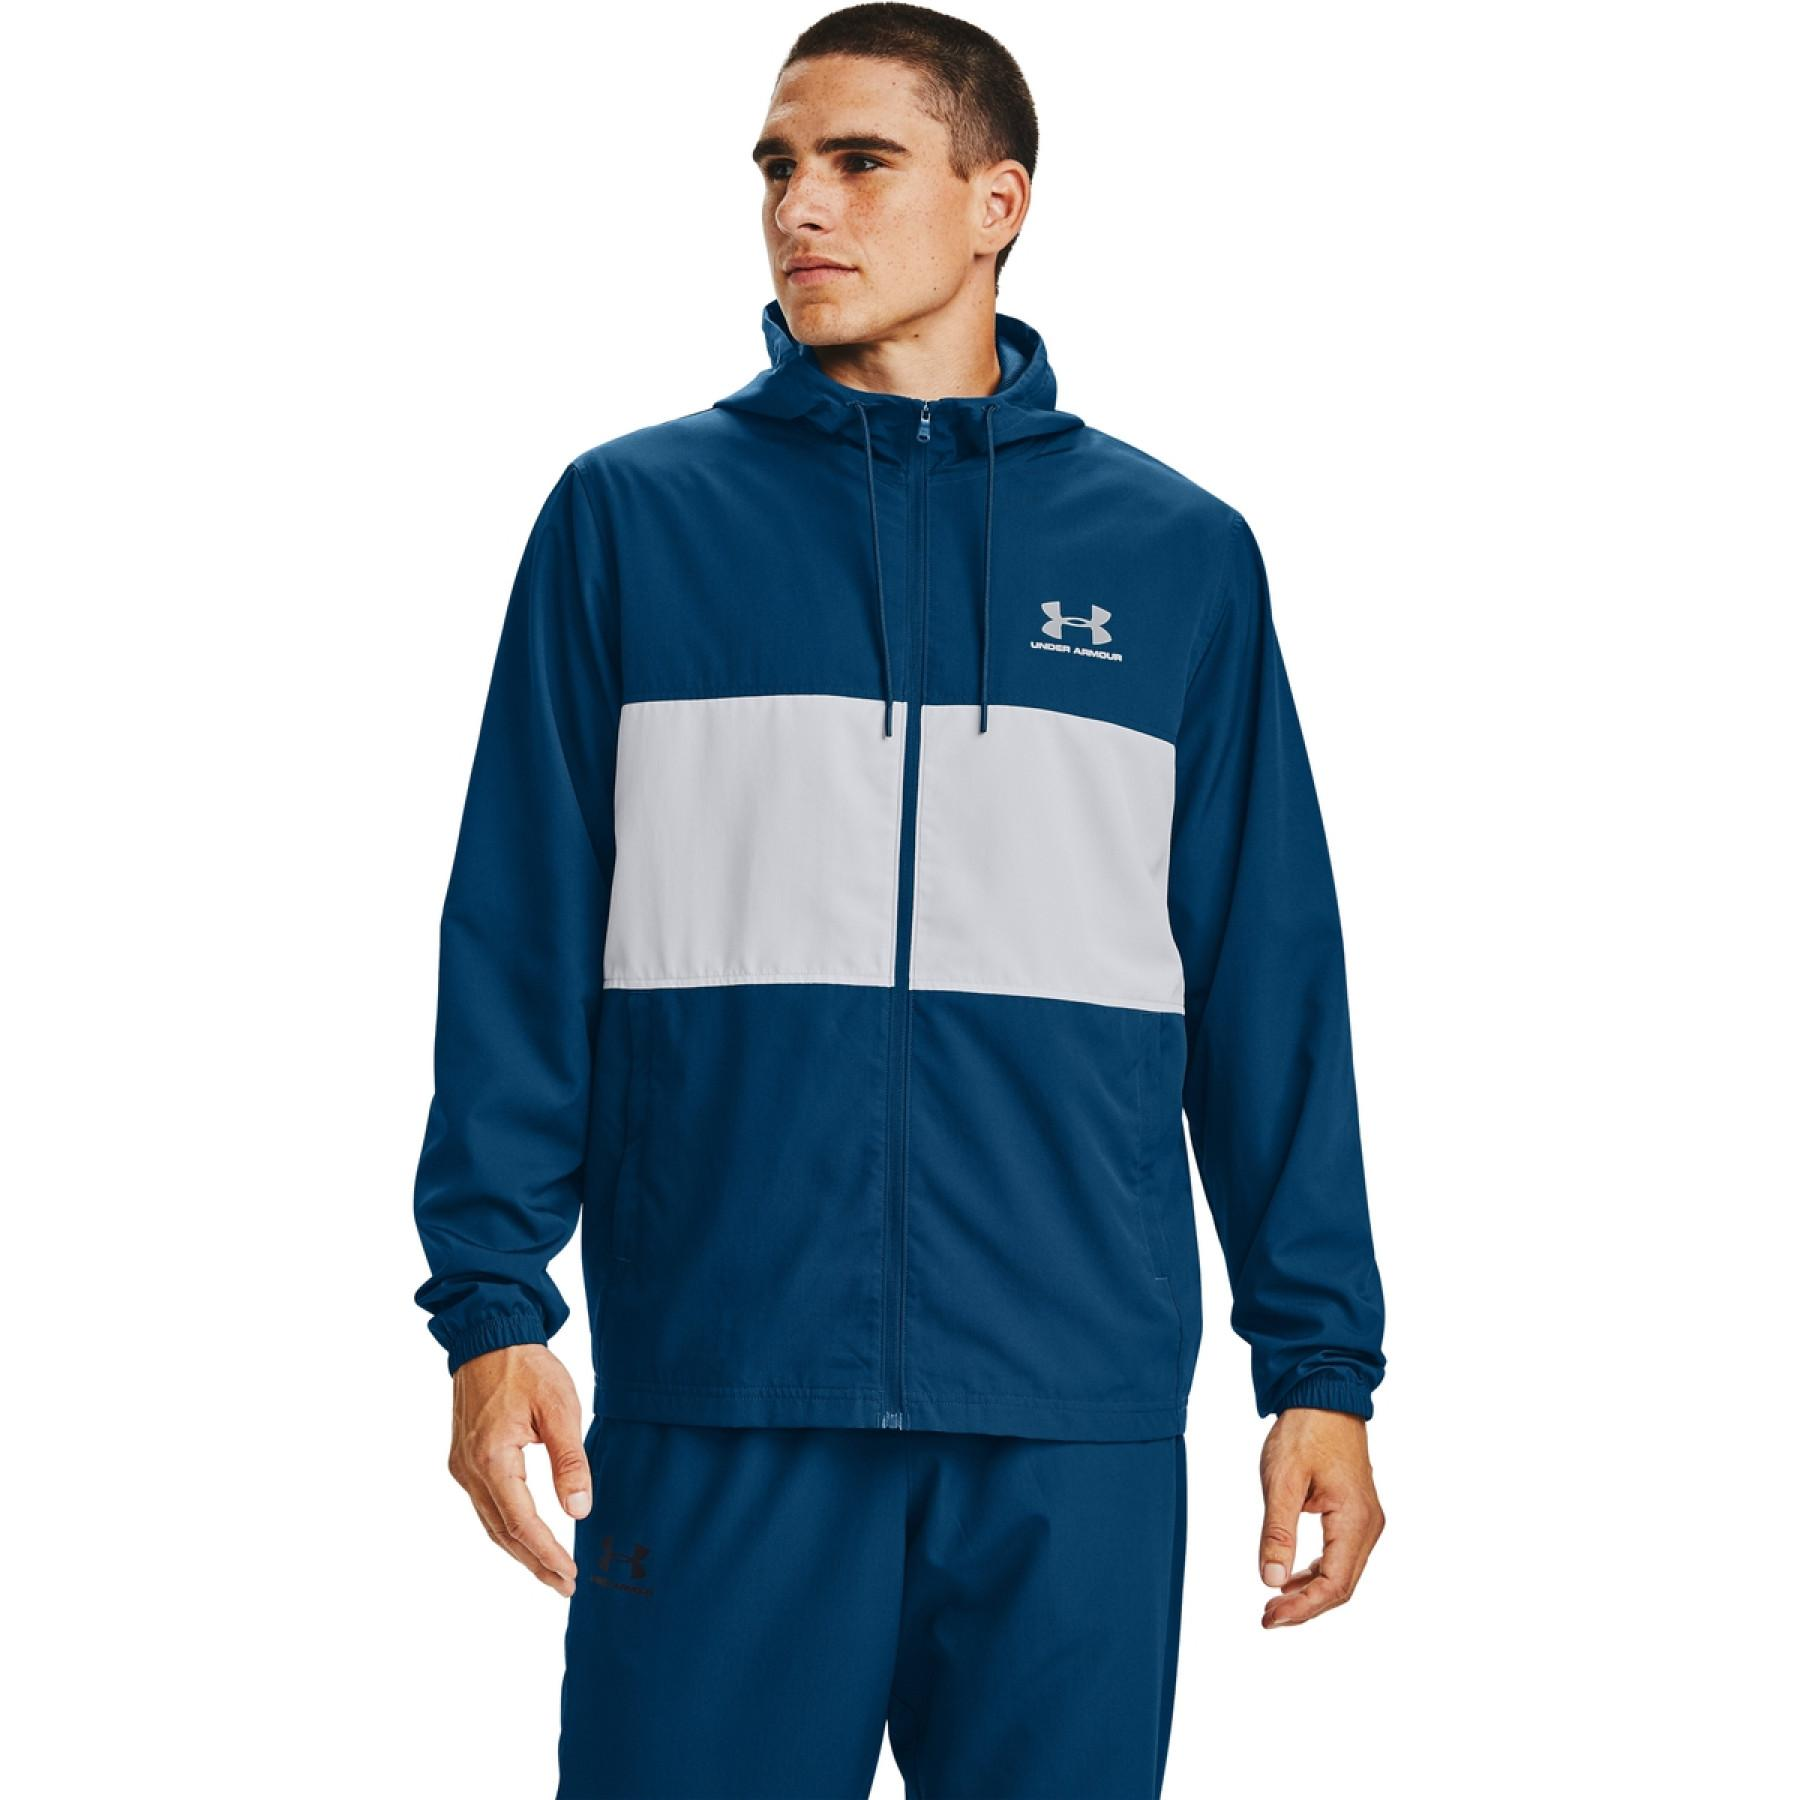 Sportstyle Under Armour Windproof Jacket